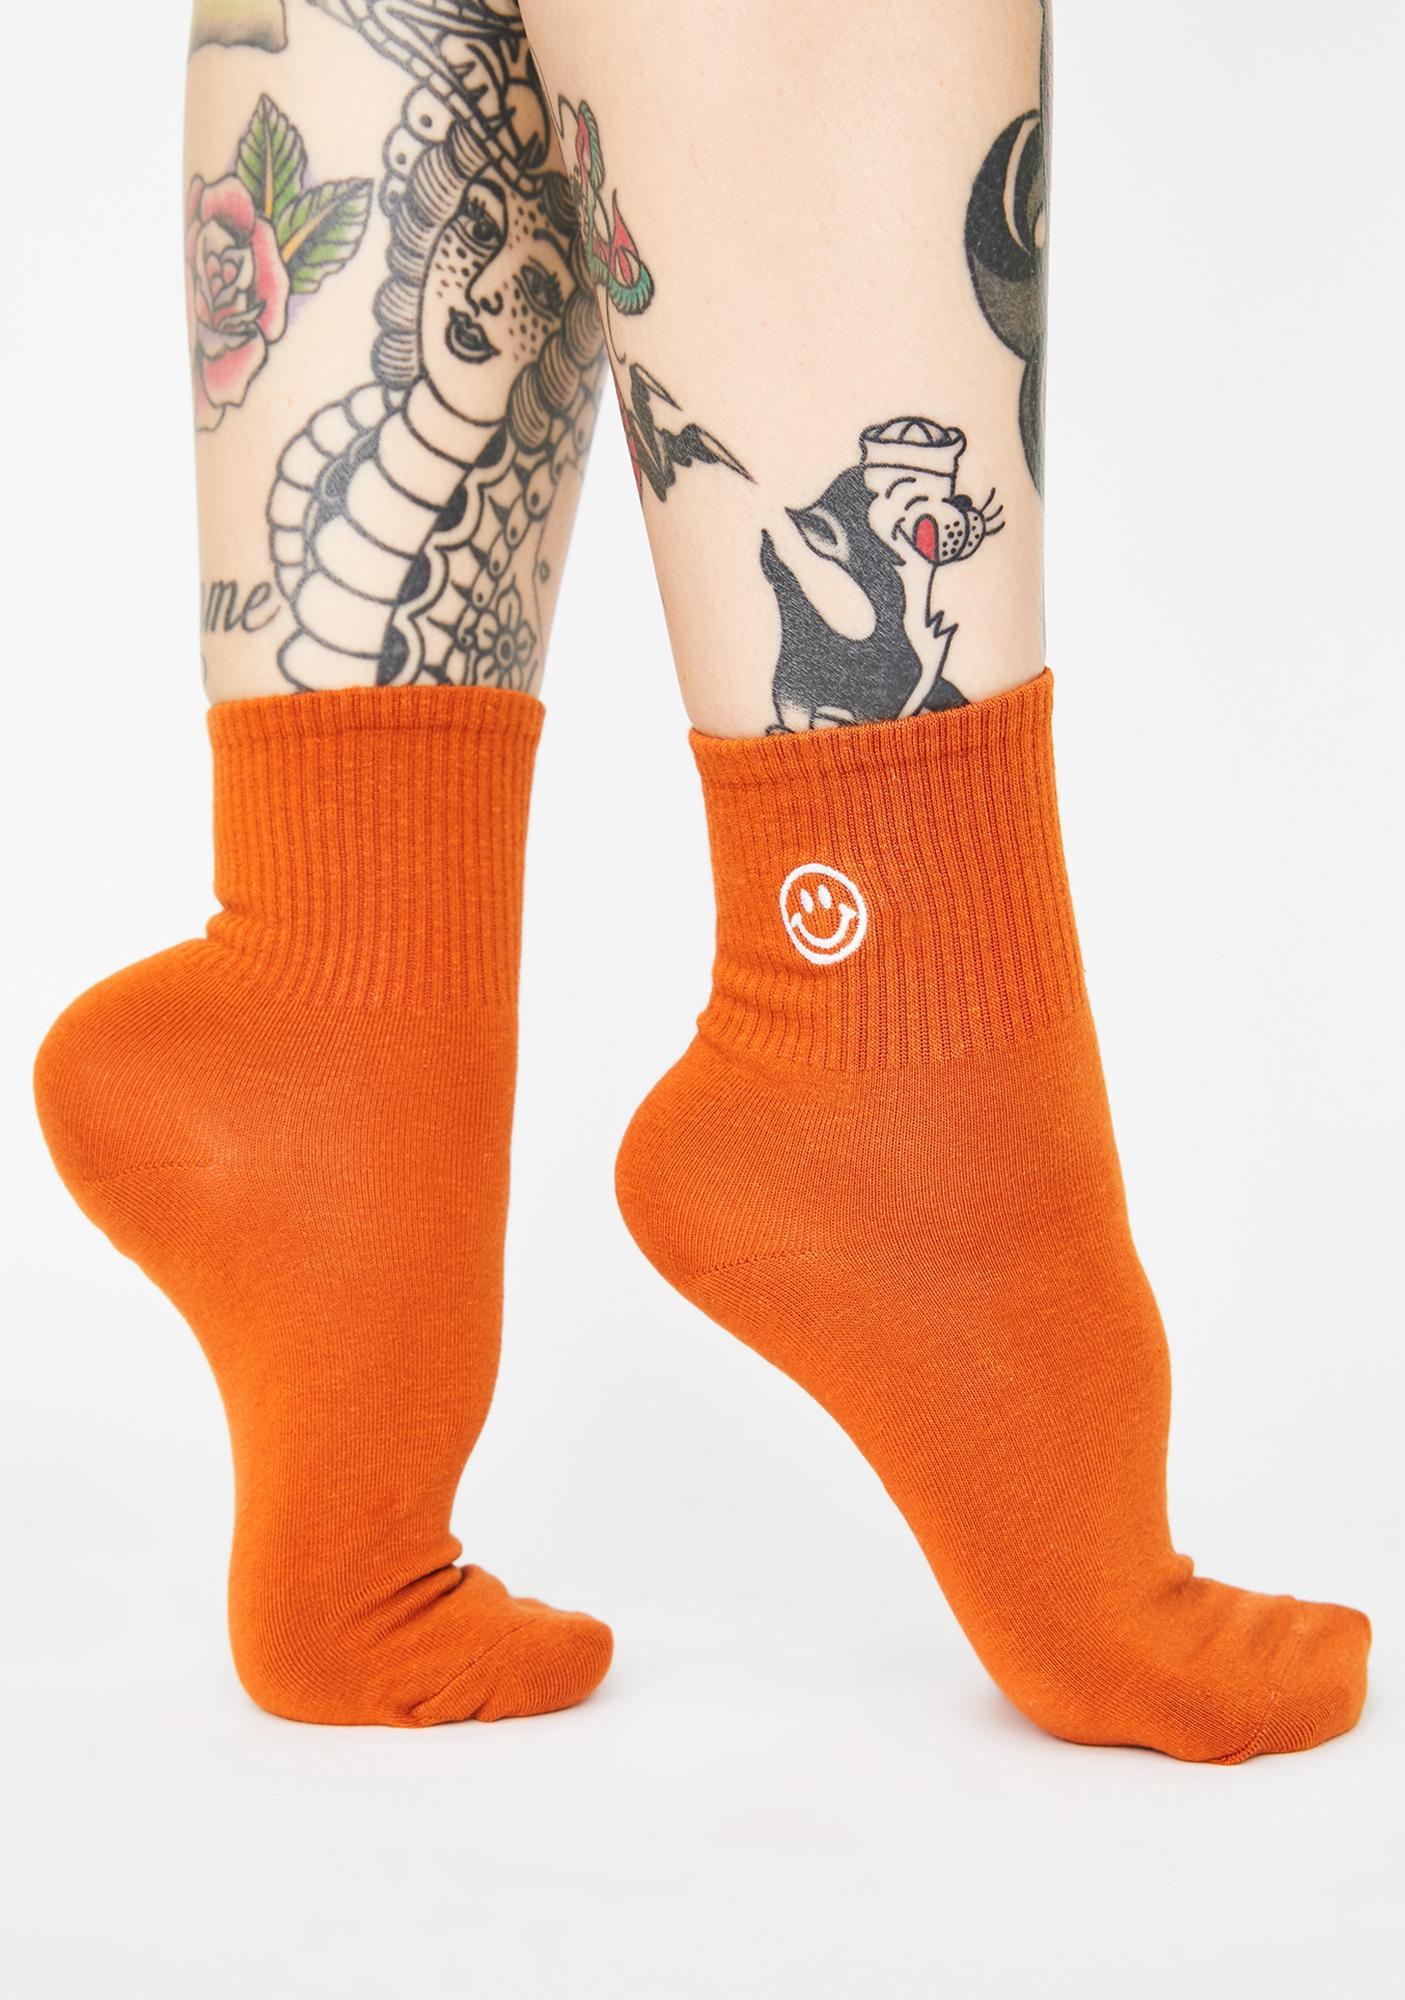 Ginger Always Upbeat Smiley Face Socks